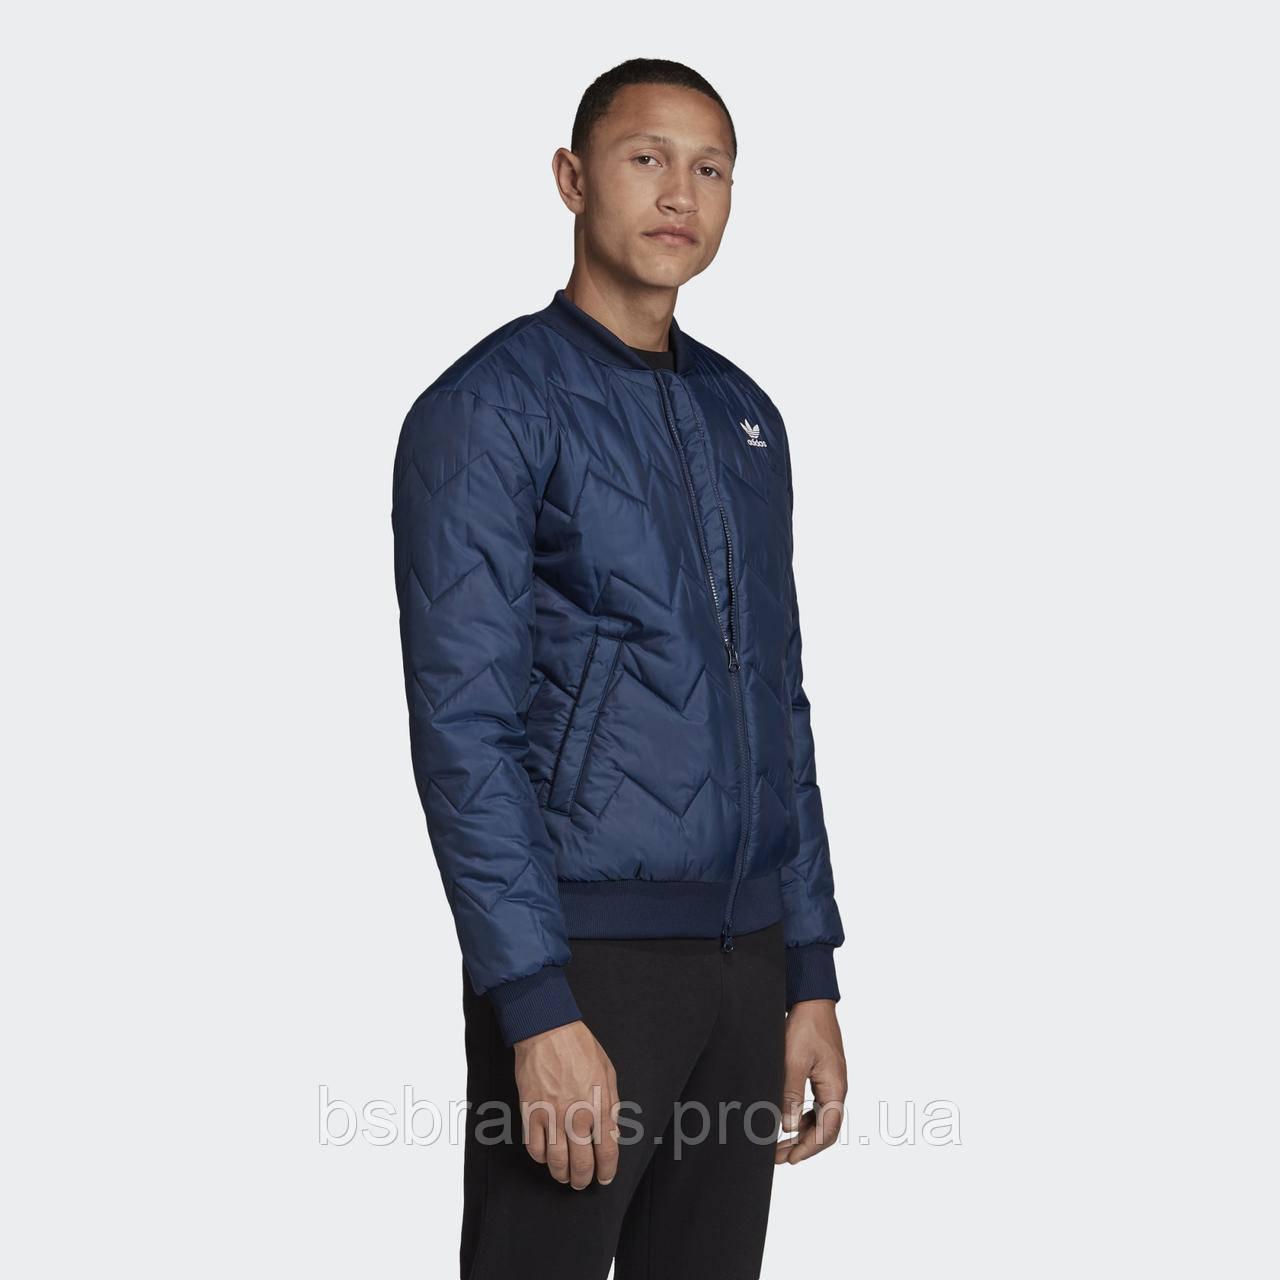 Мужская стеганая куртка adidas SST FL0018